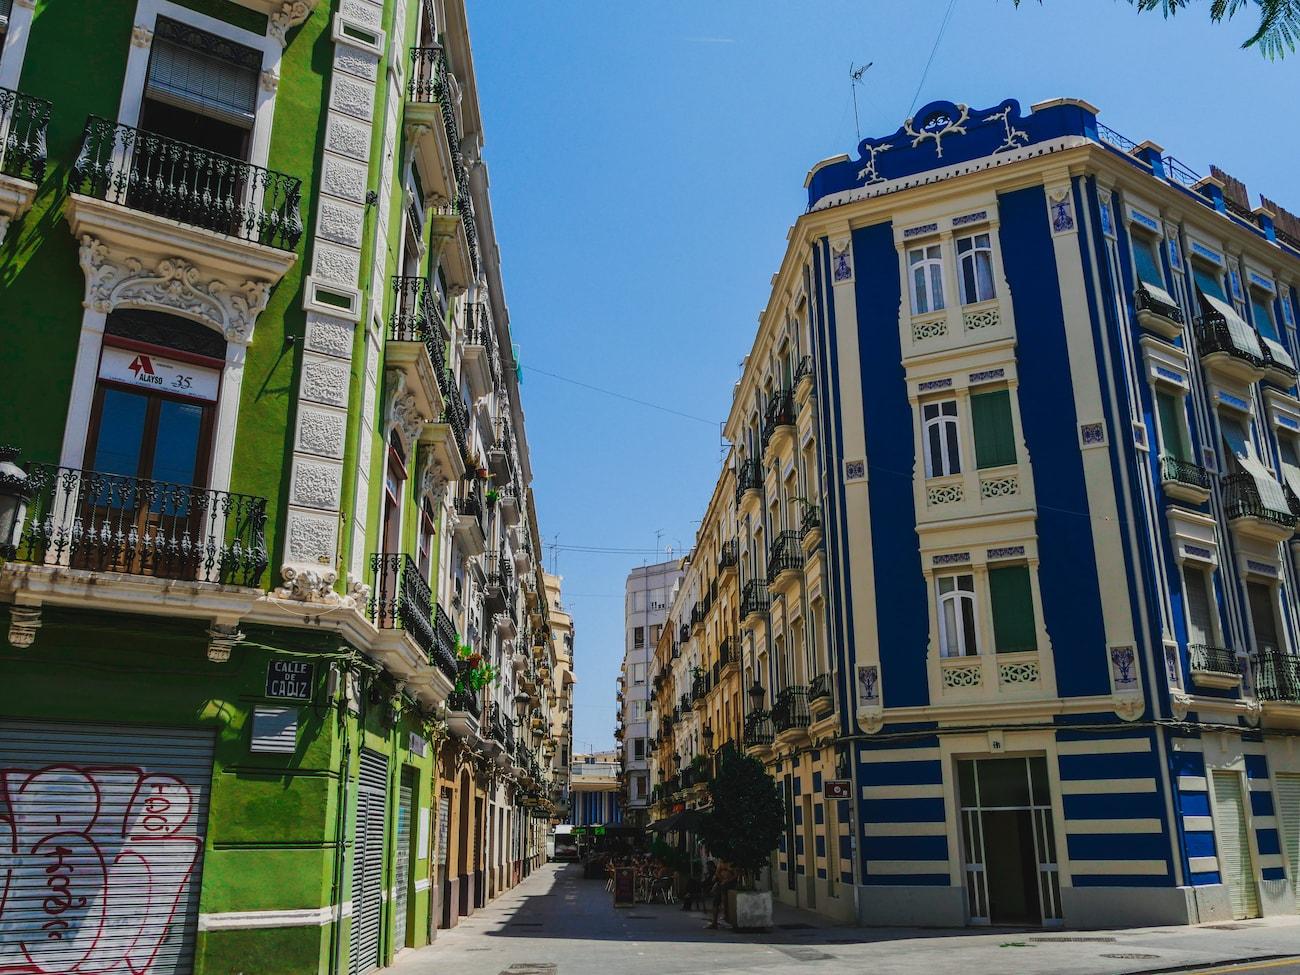 Valence en Espagne